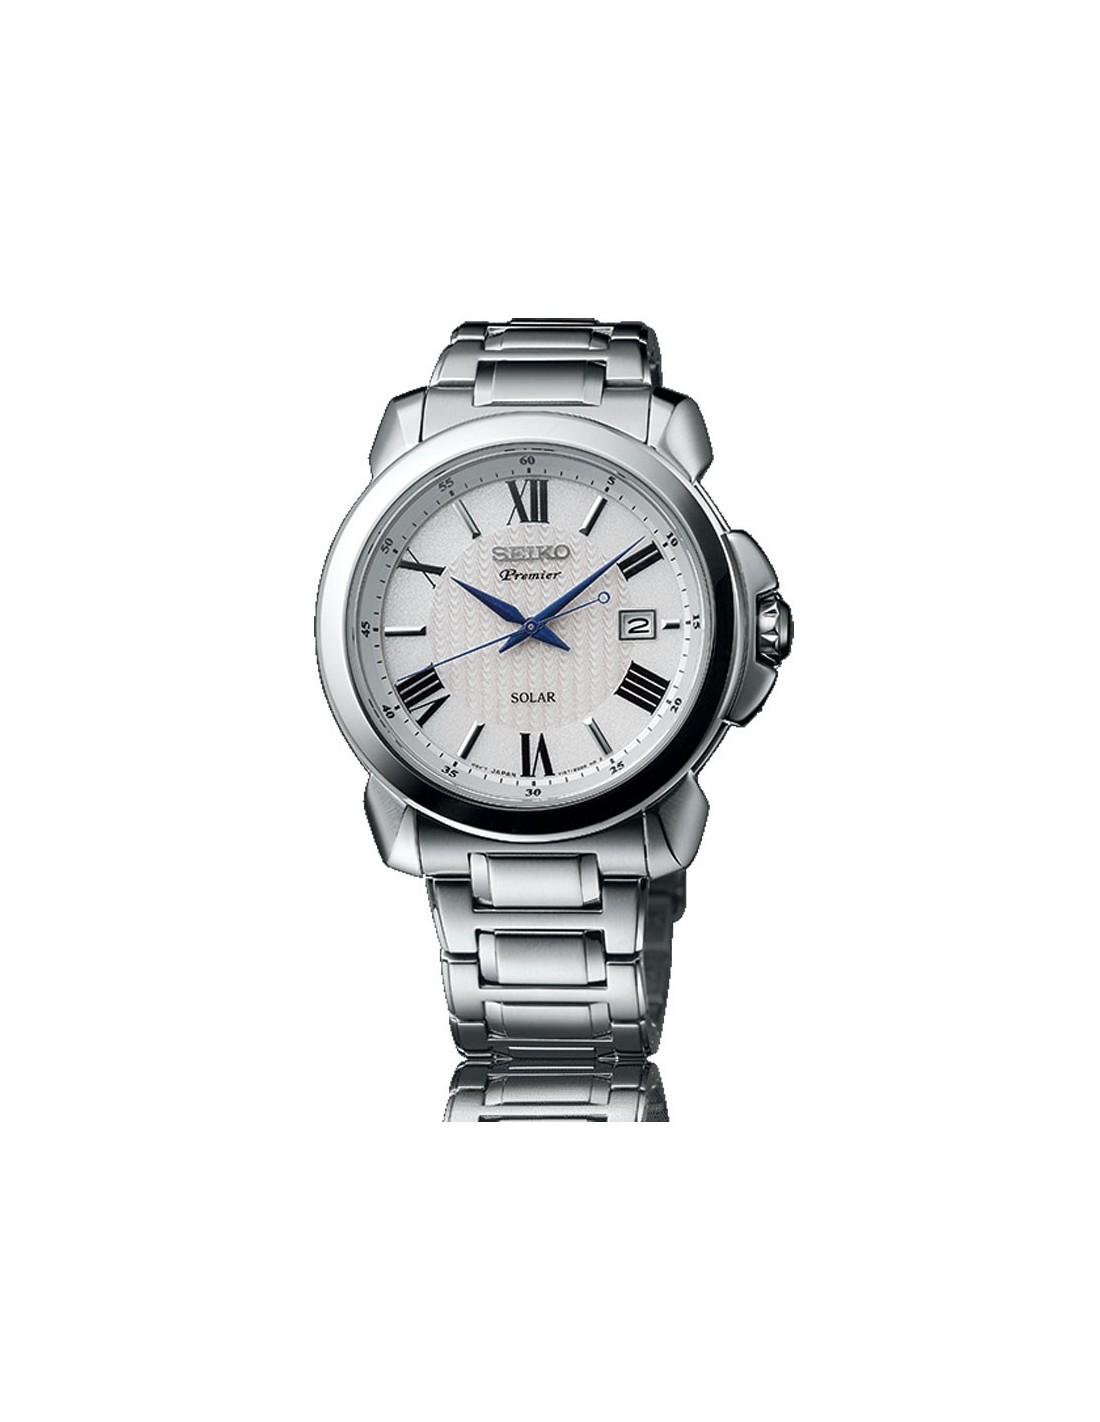 Sne Stock Price >> SNE453P1 Seiko Premier Solar Watch | SNE453P1